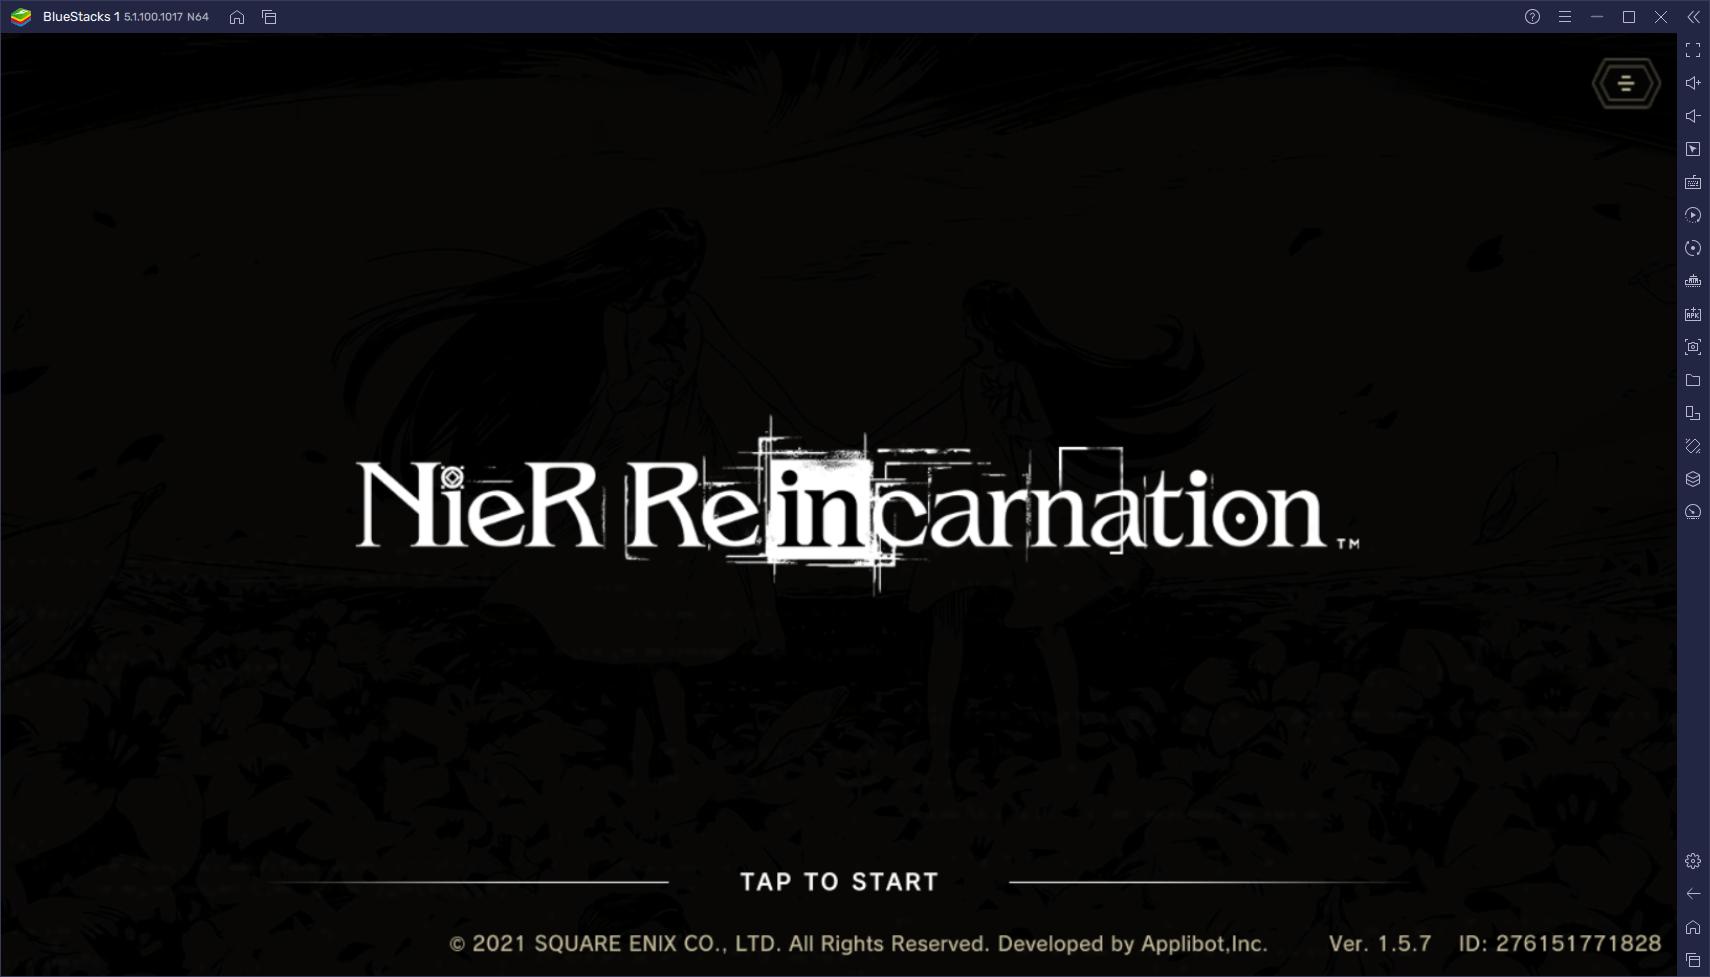 Reroll-Leitfaden für NieR Reincarnation – Wie man von Anfang an die besten Charaktere erhält